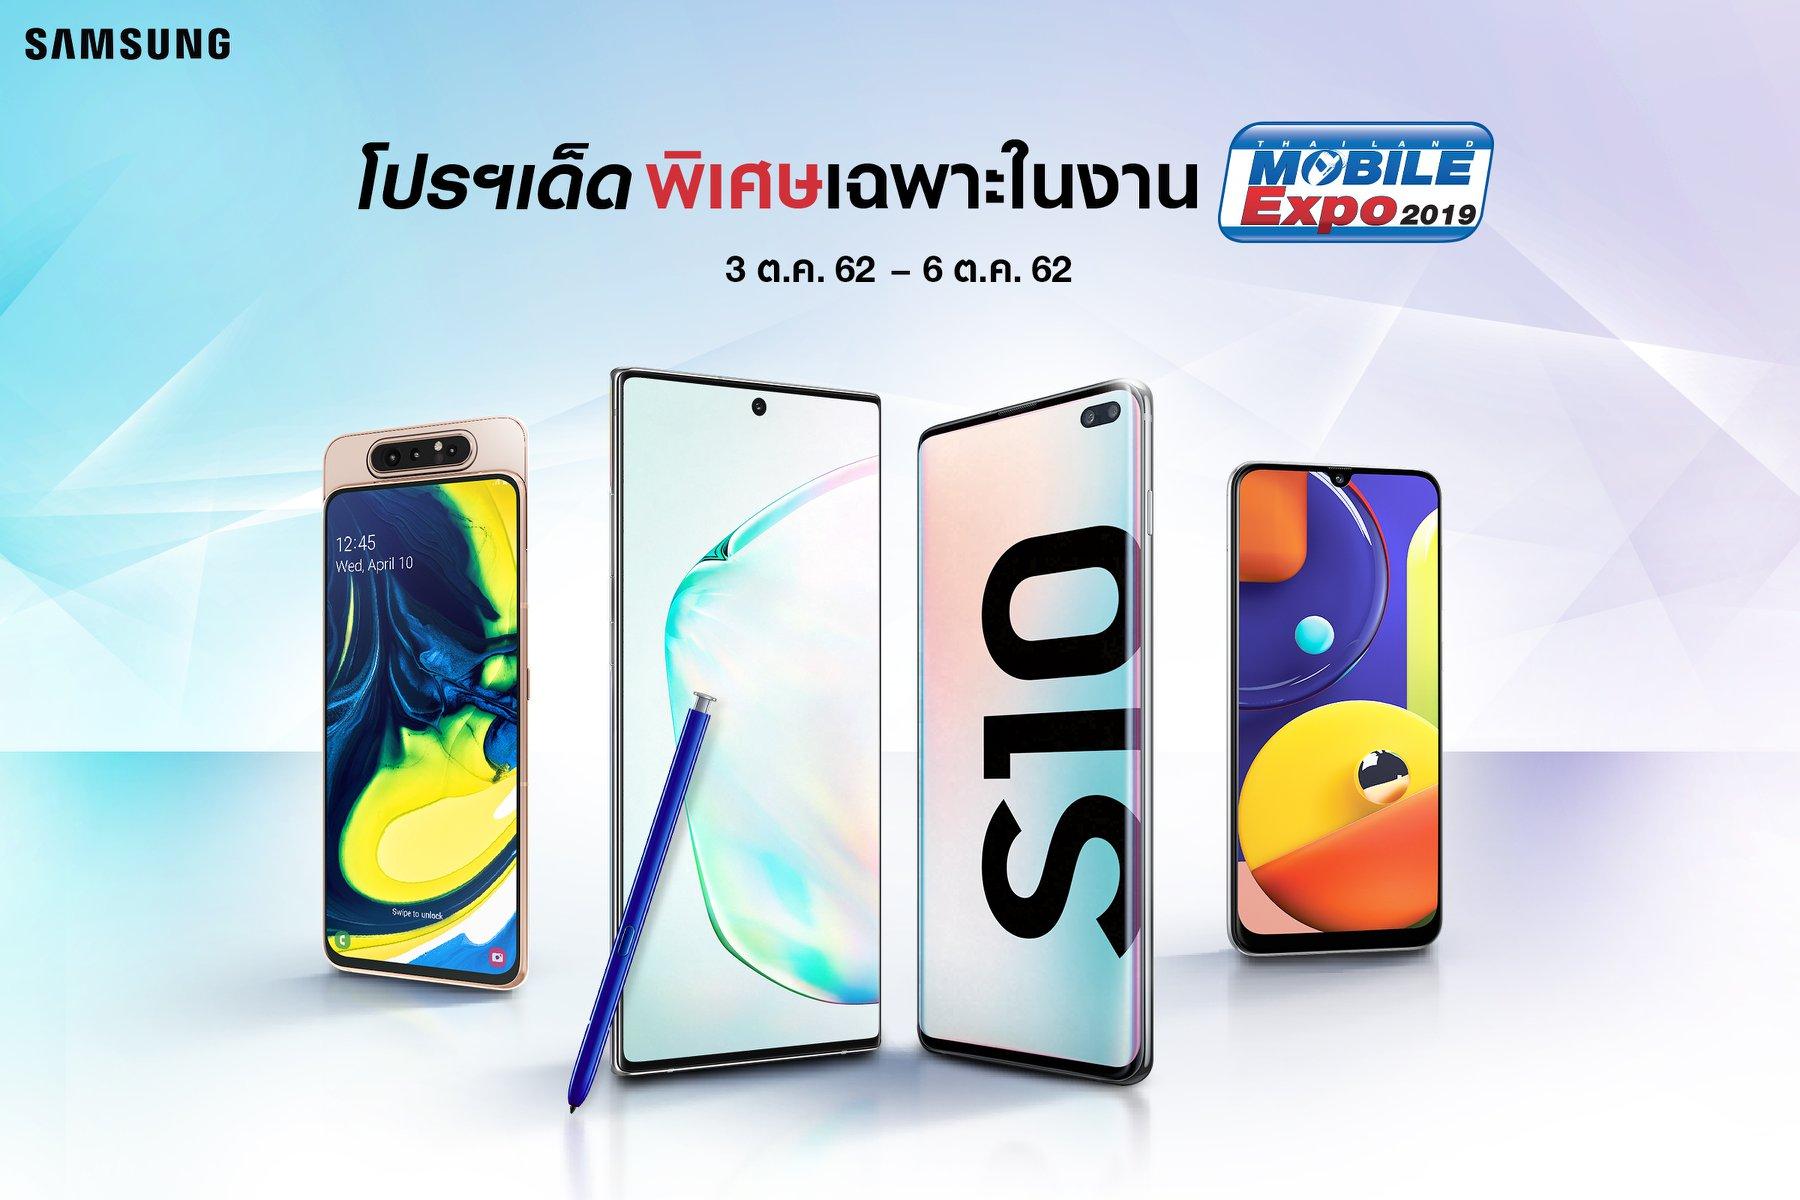 Pro Samsung Galaxy Mobile Expo 2019 oct